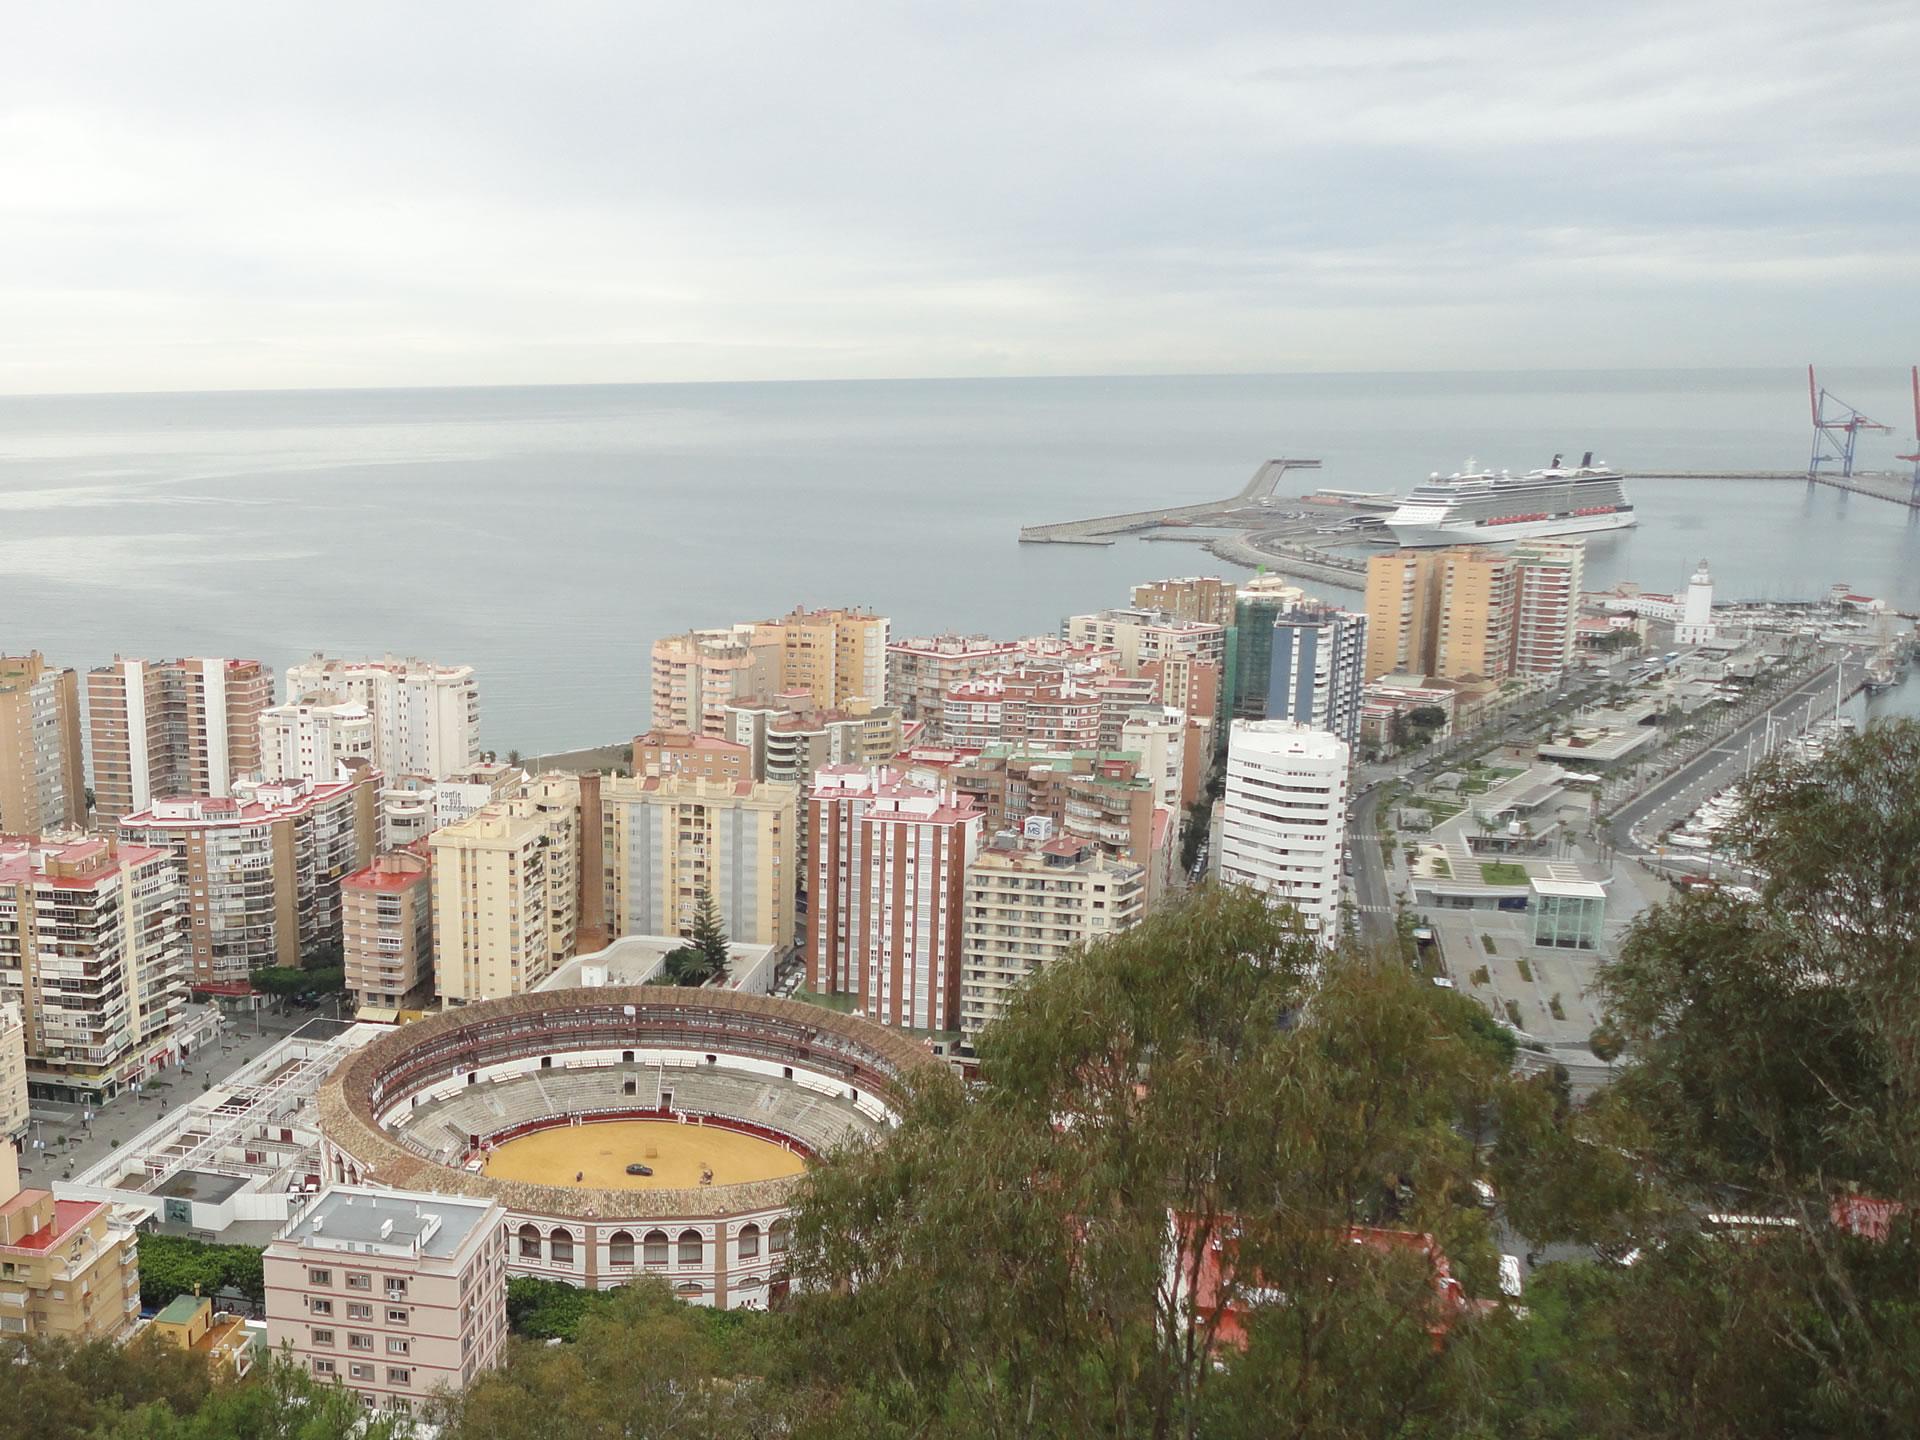 Top Historic Sites in Malaga